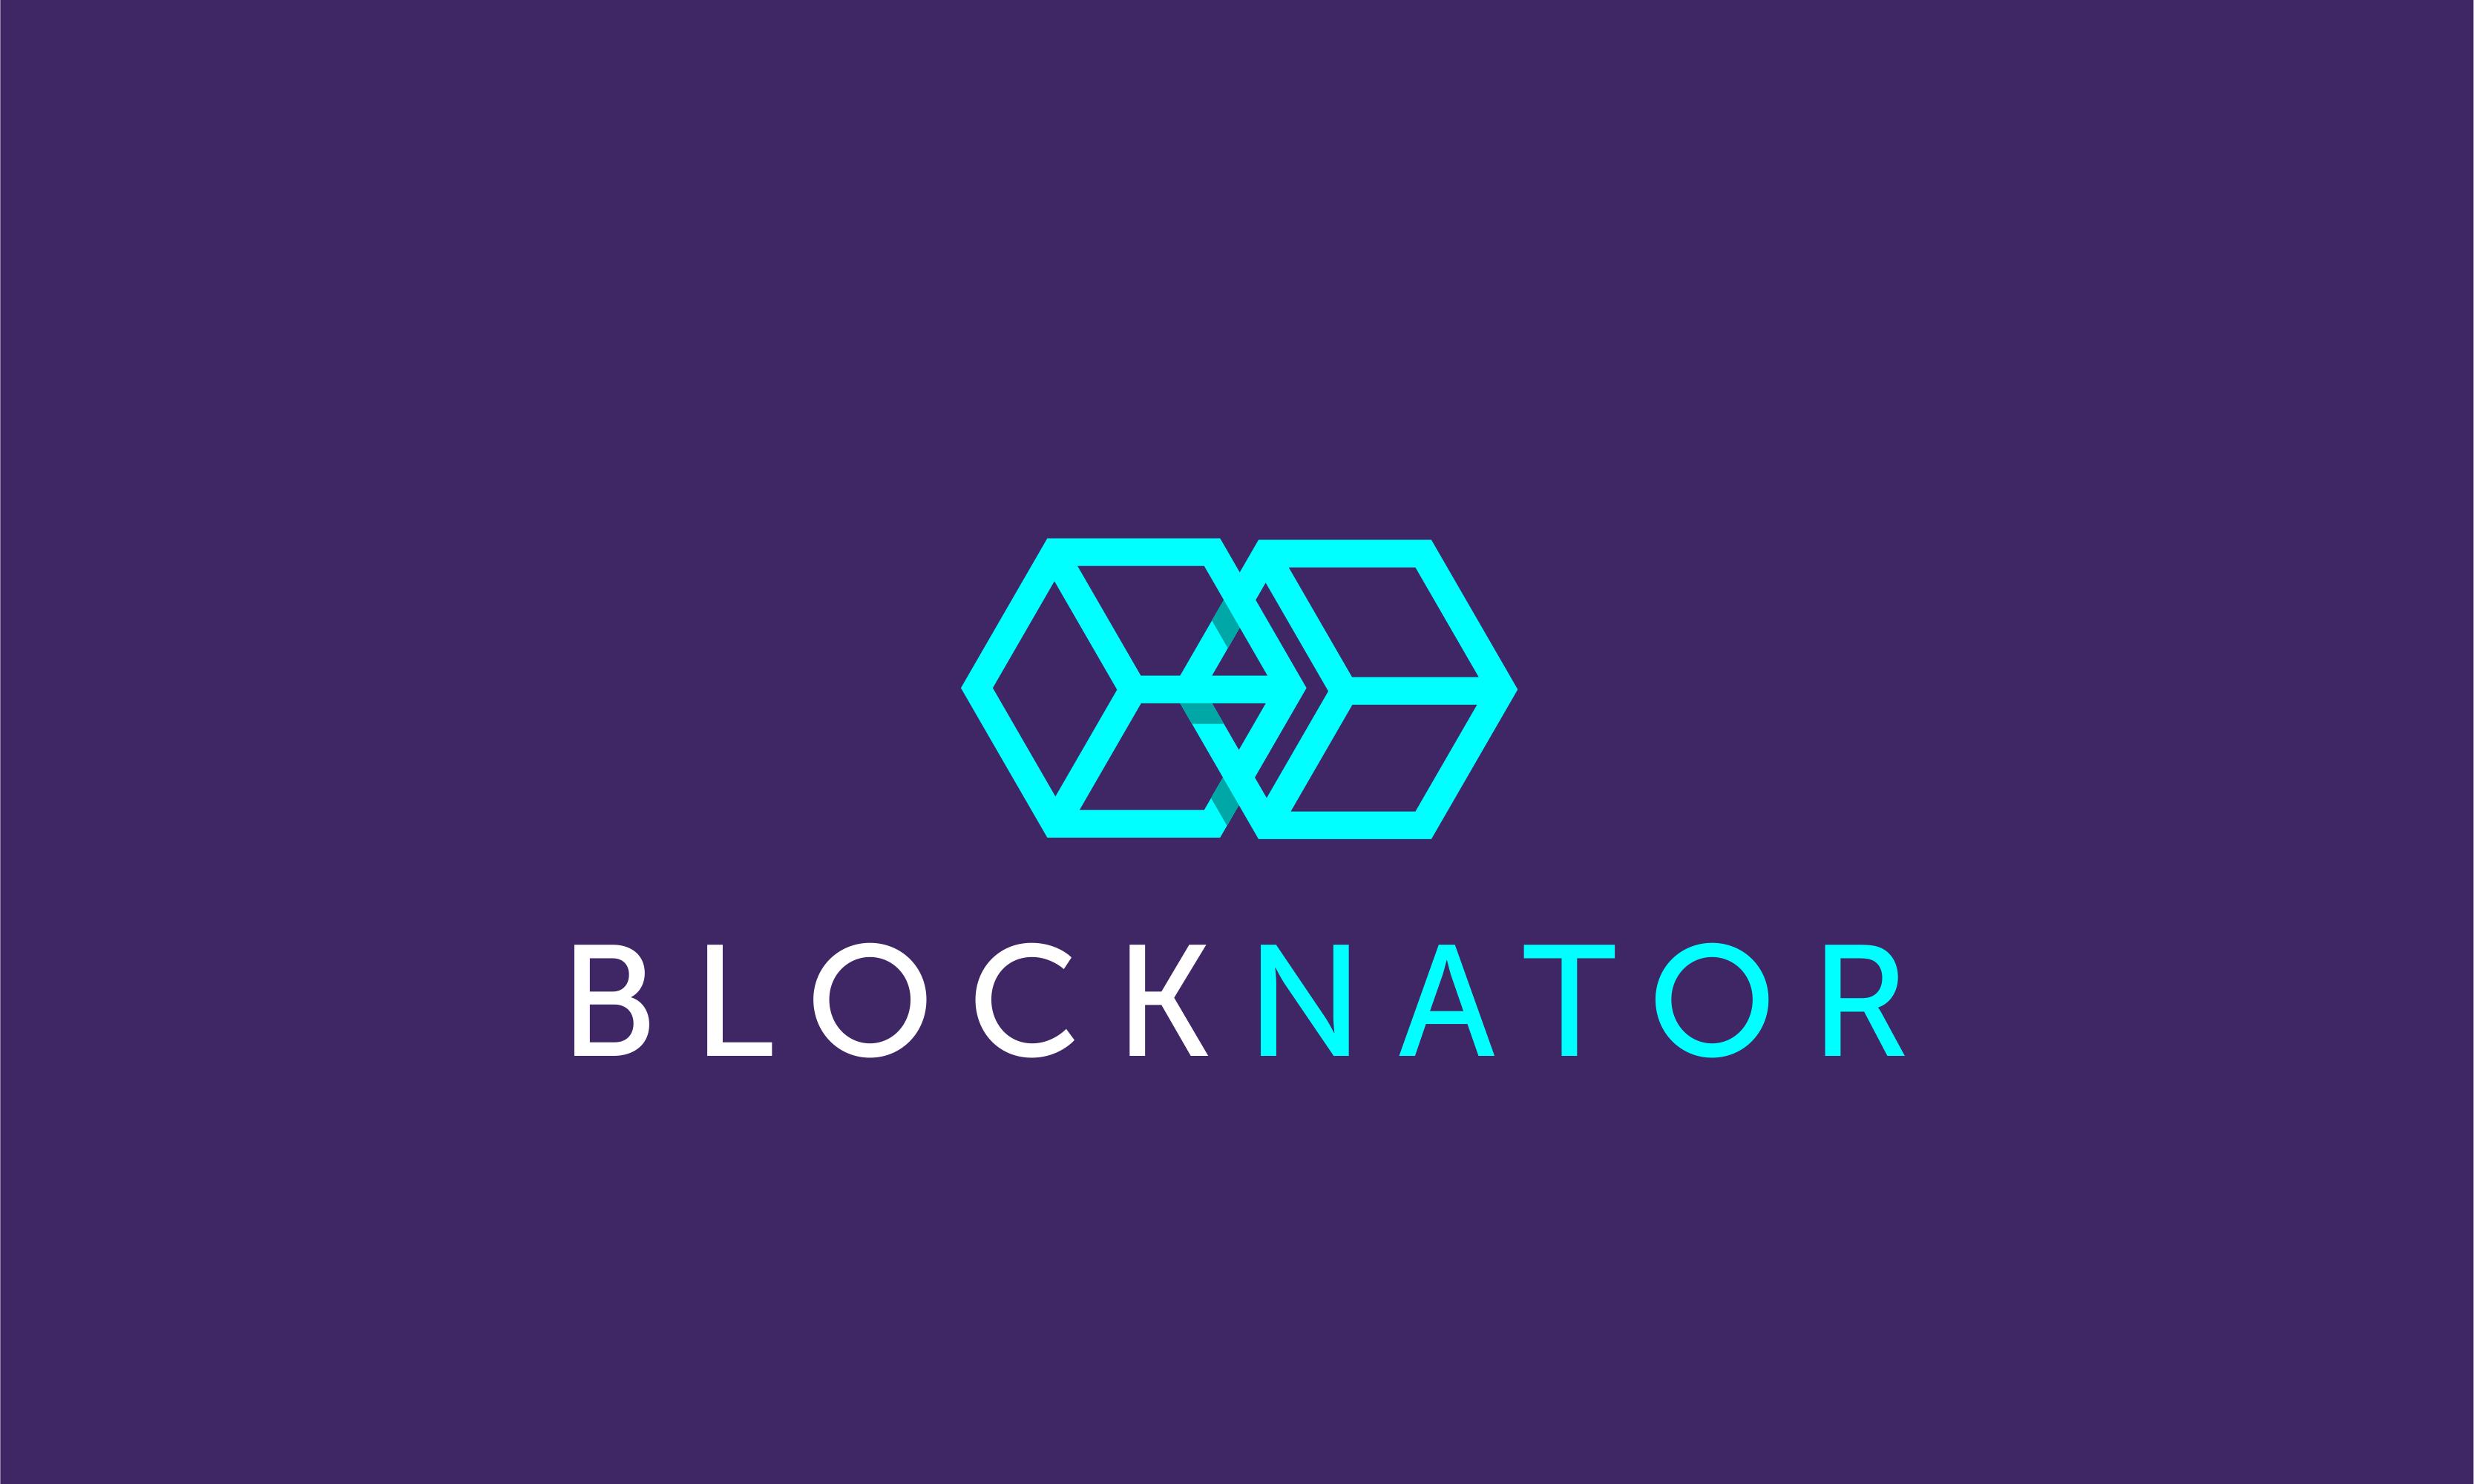 Blocknator